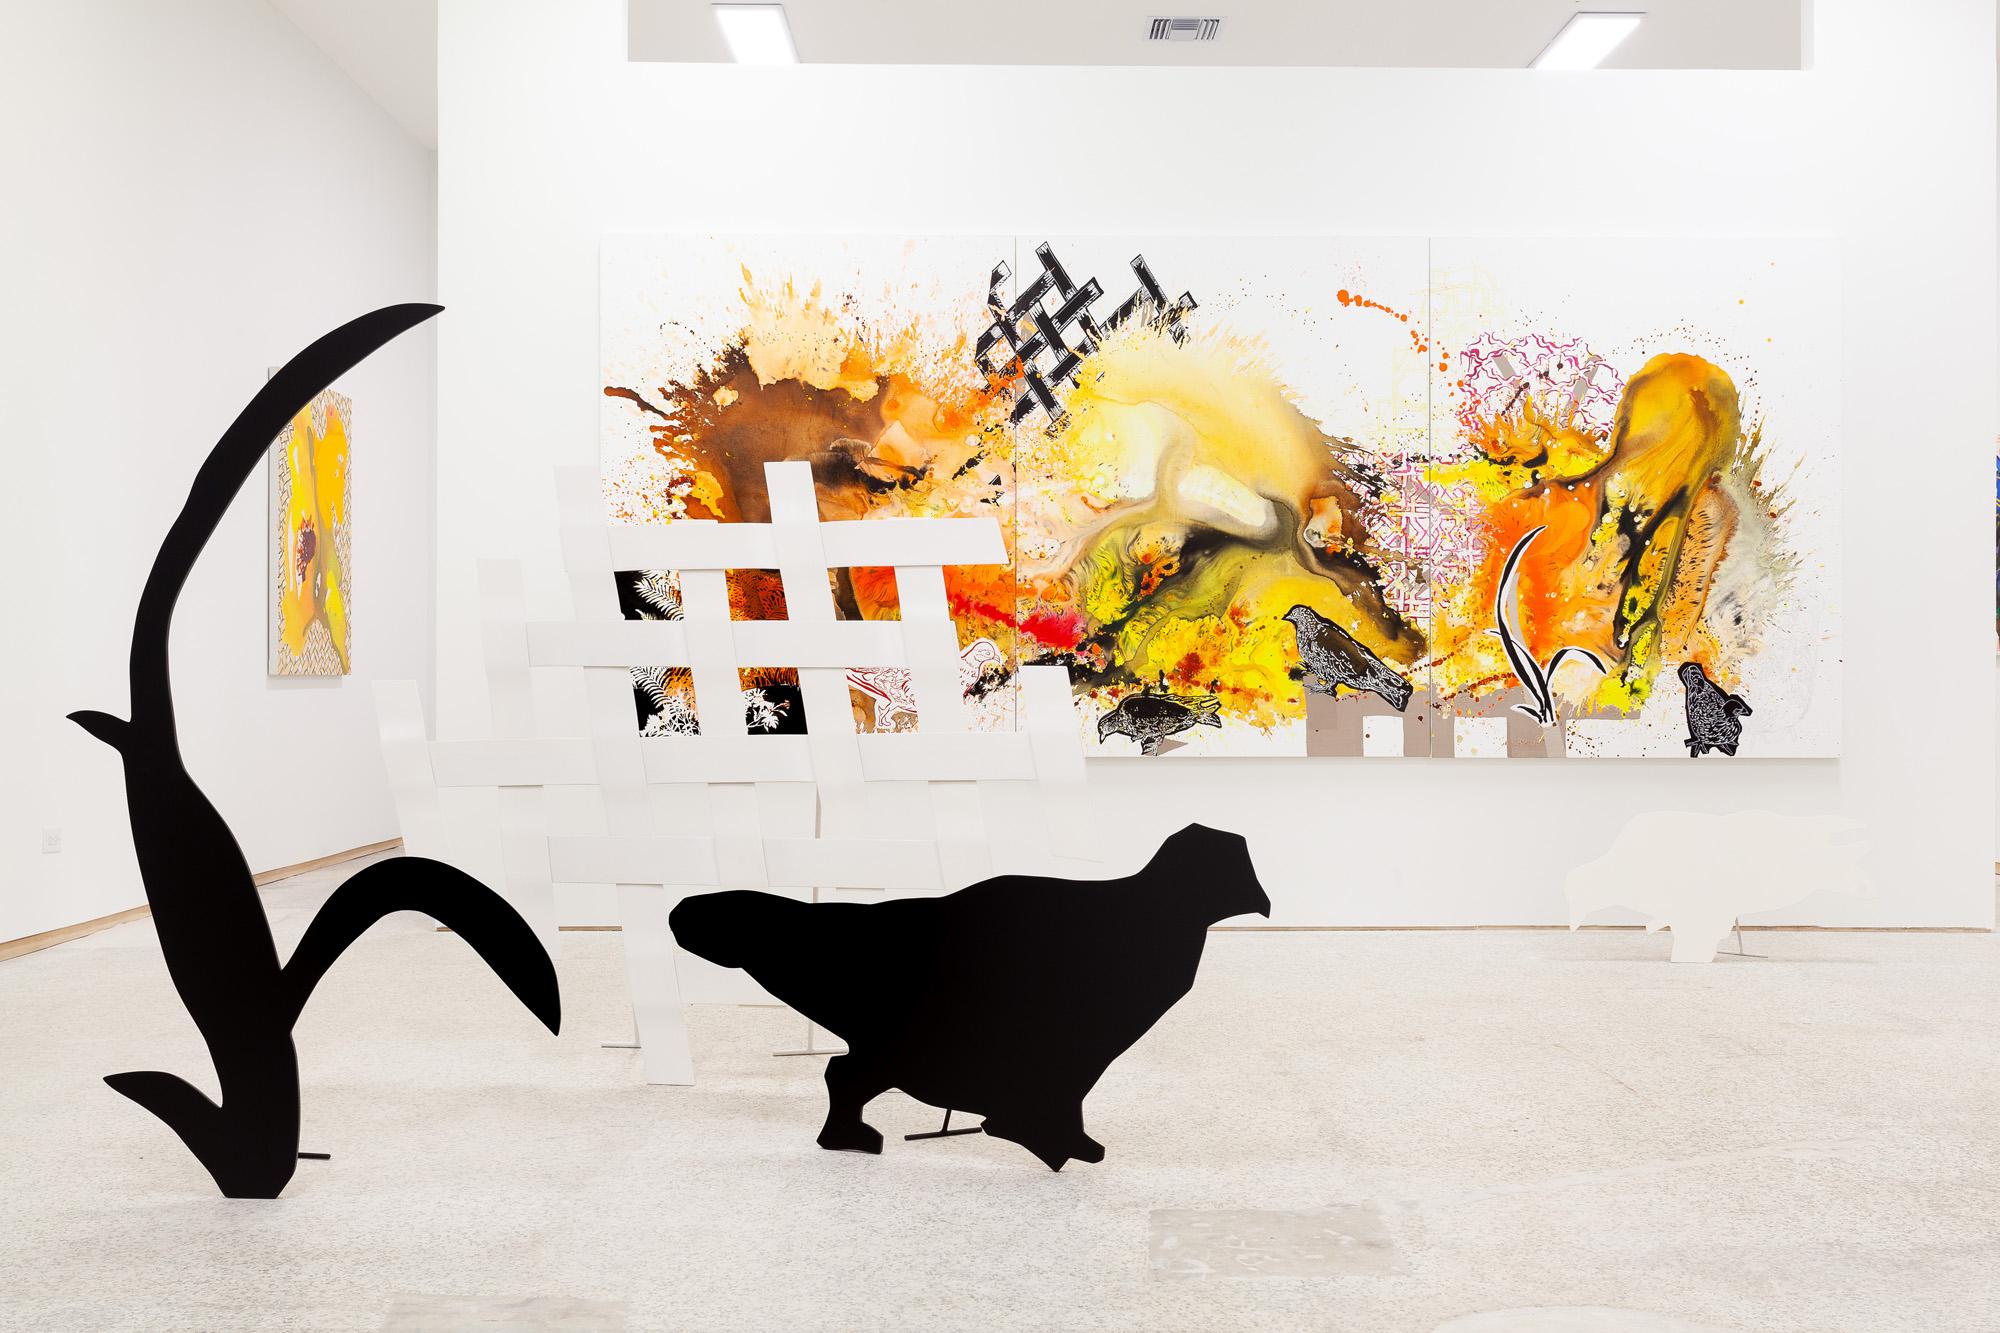 Elisabeth Condon, 2019 Installation view Effulgence at Emerson Dorsch